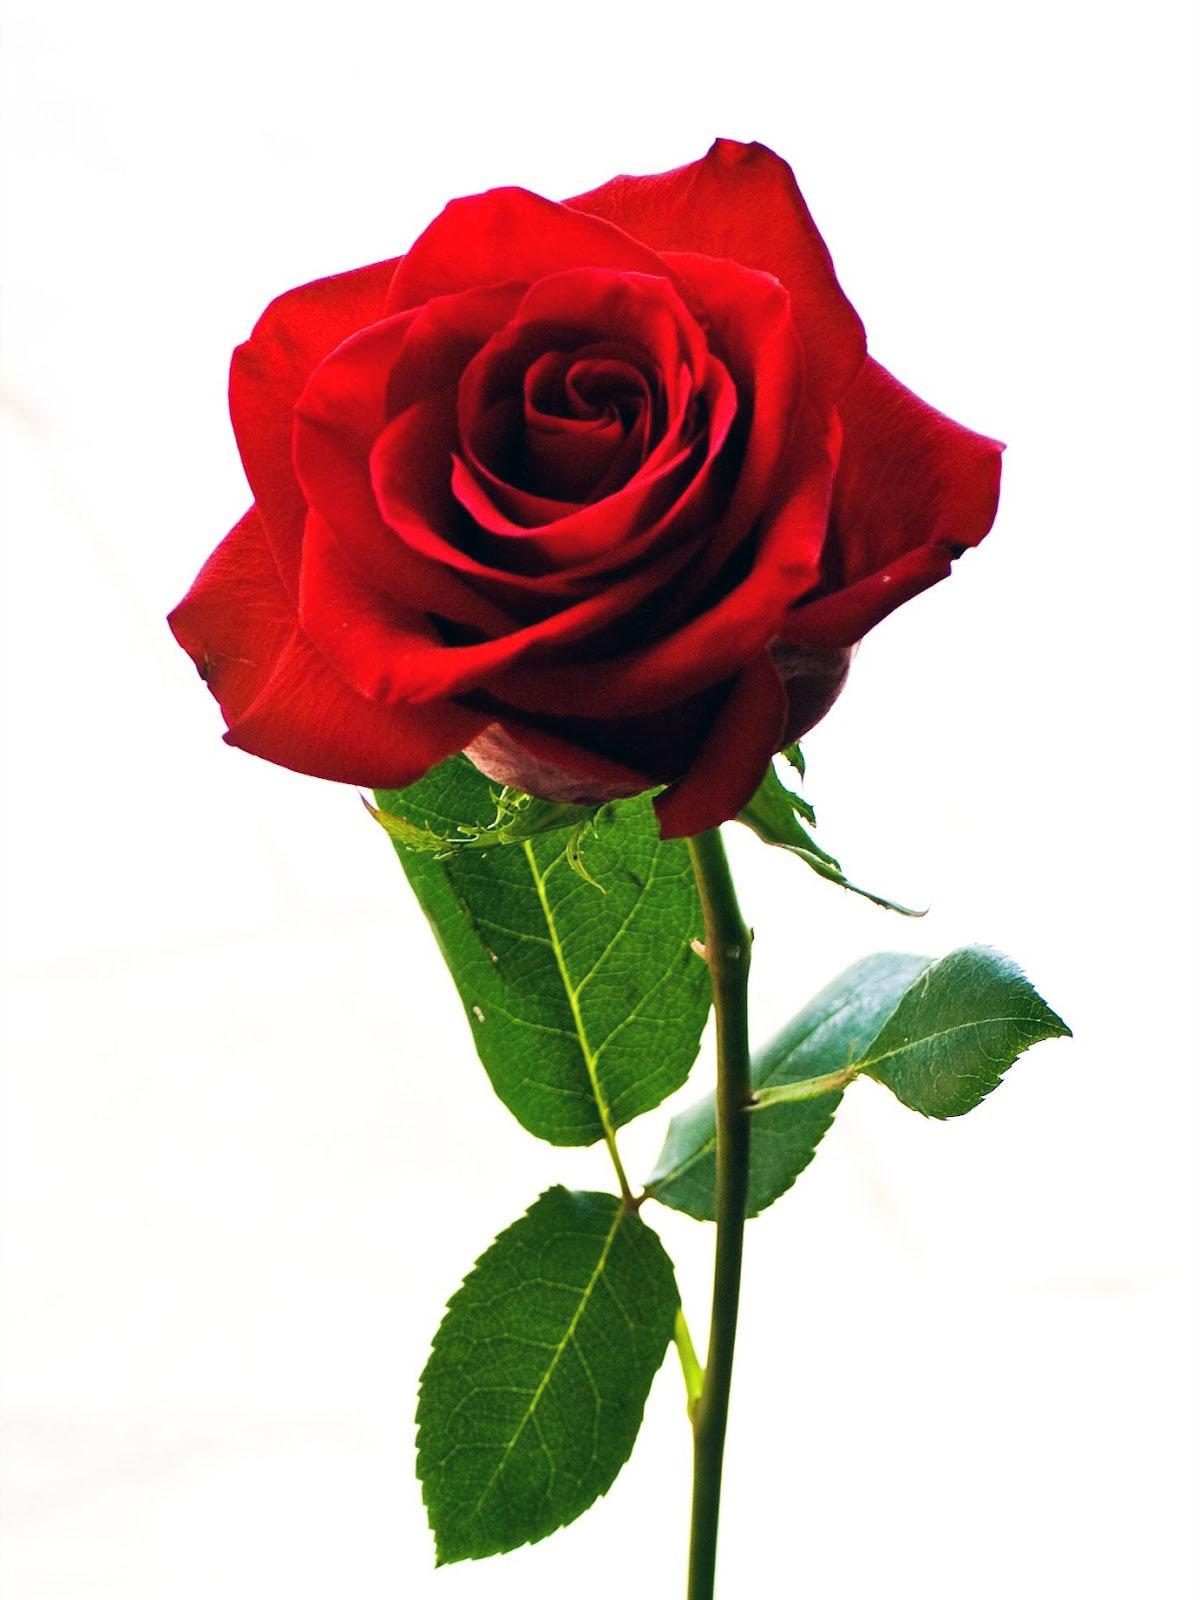 Bunga Mawar - Ciri-Ciri, Karakteristik Dan Klasifikasi